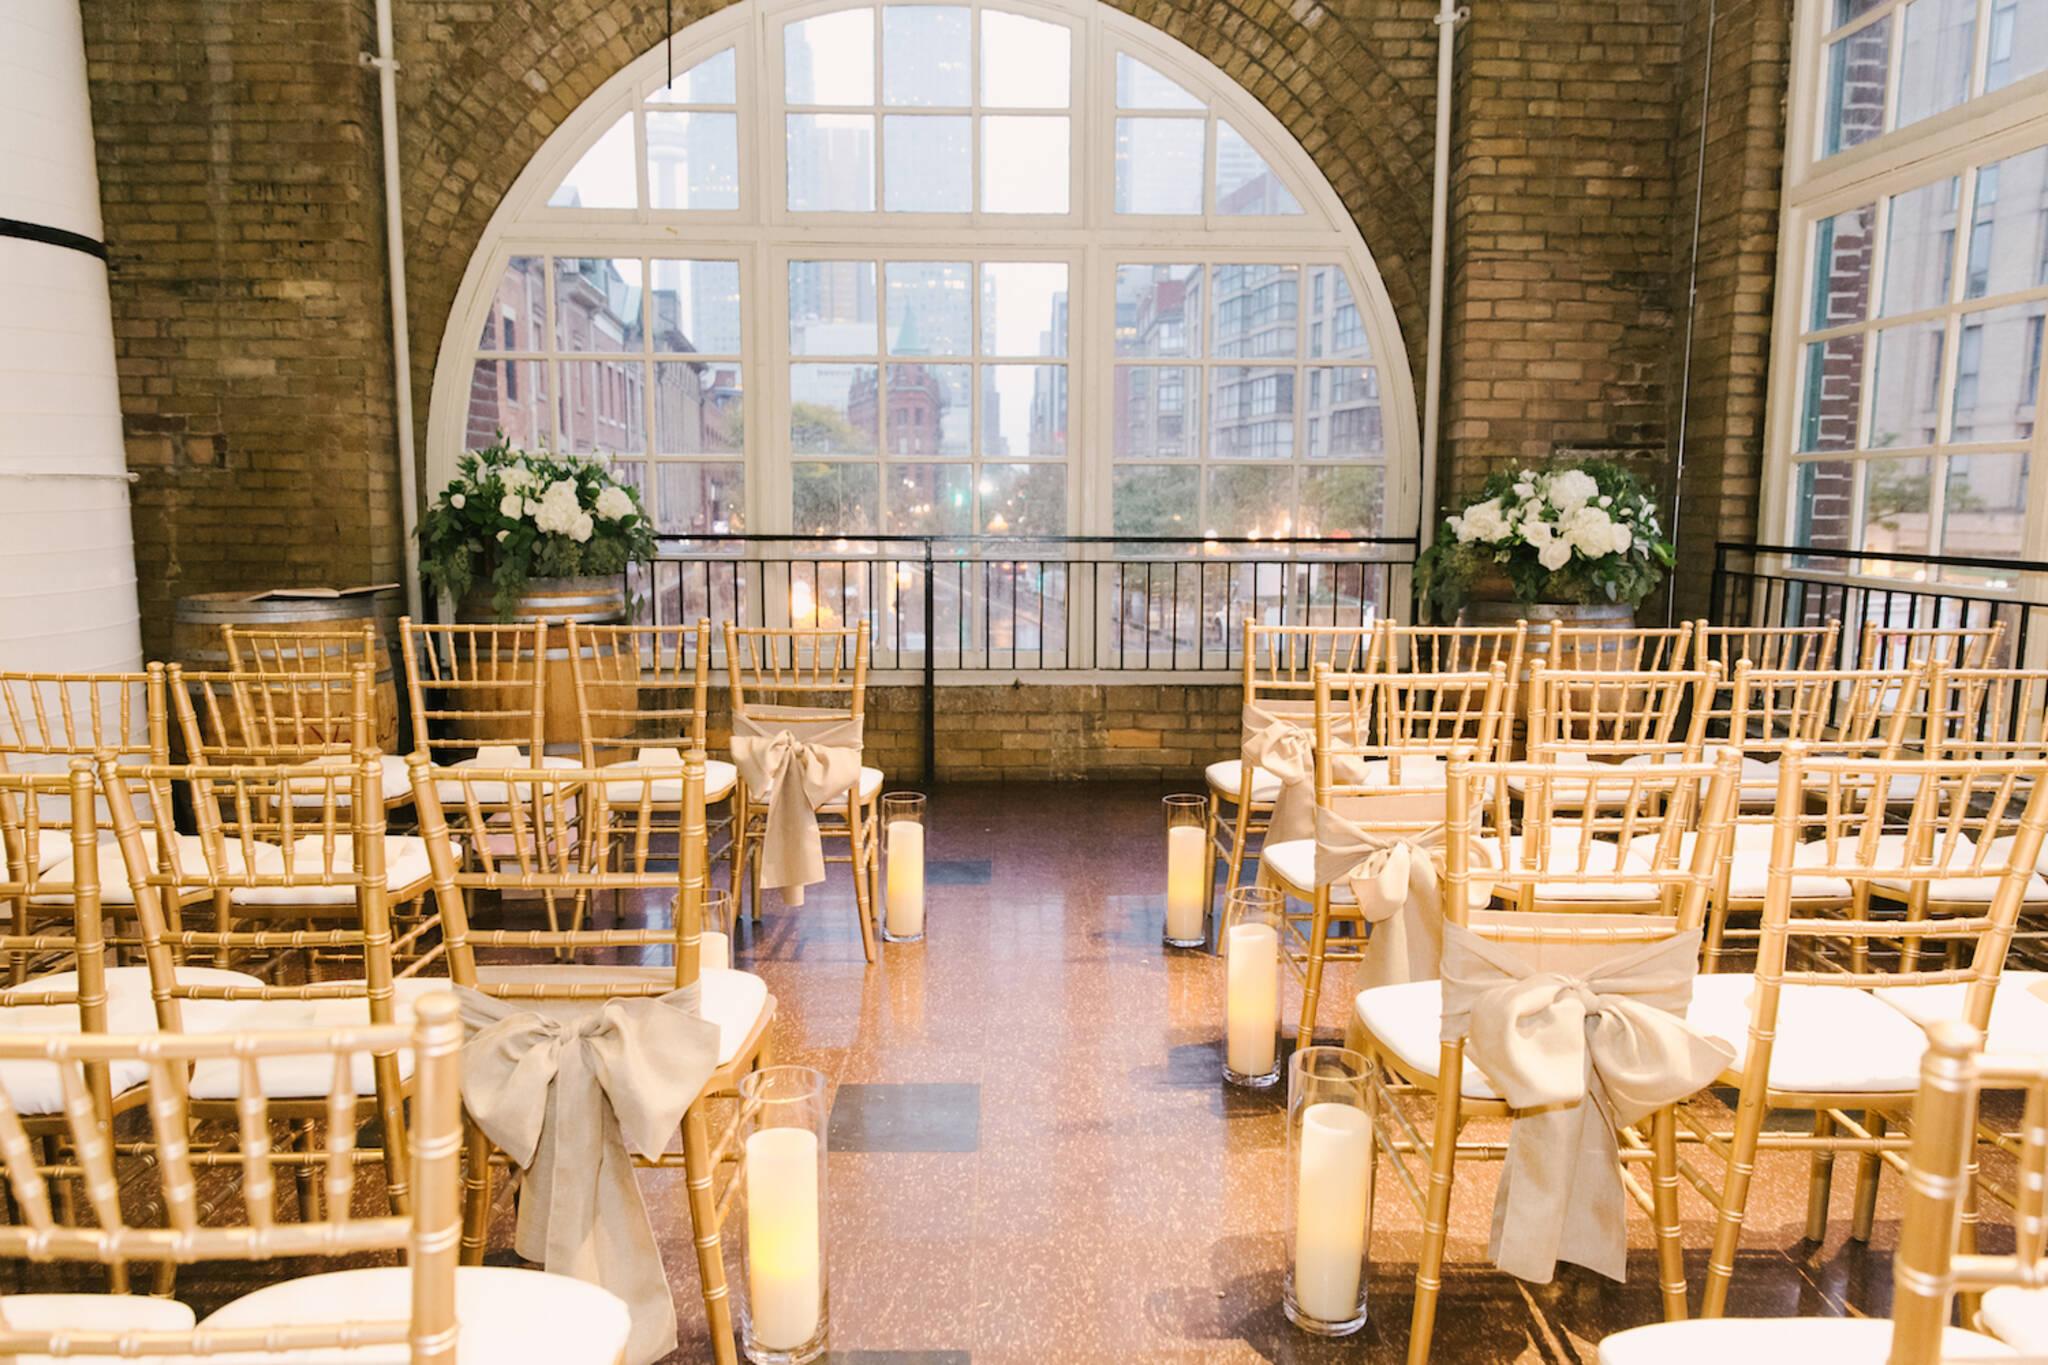 Wedding Reception London Gallery Decoration Ideas